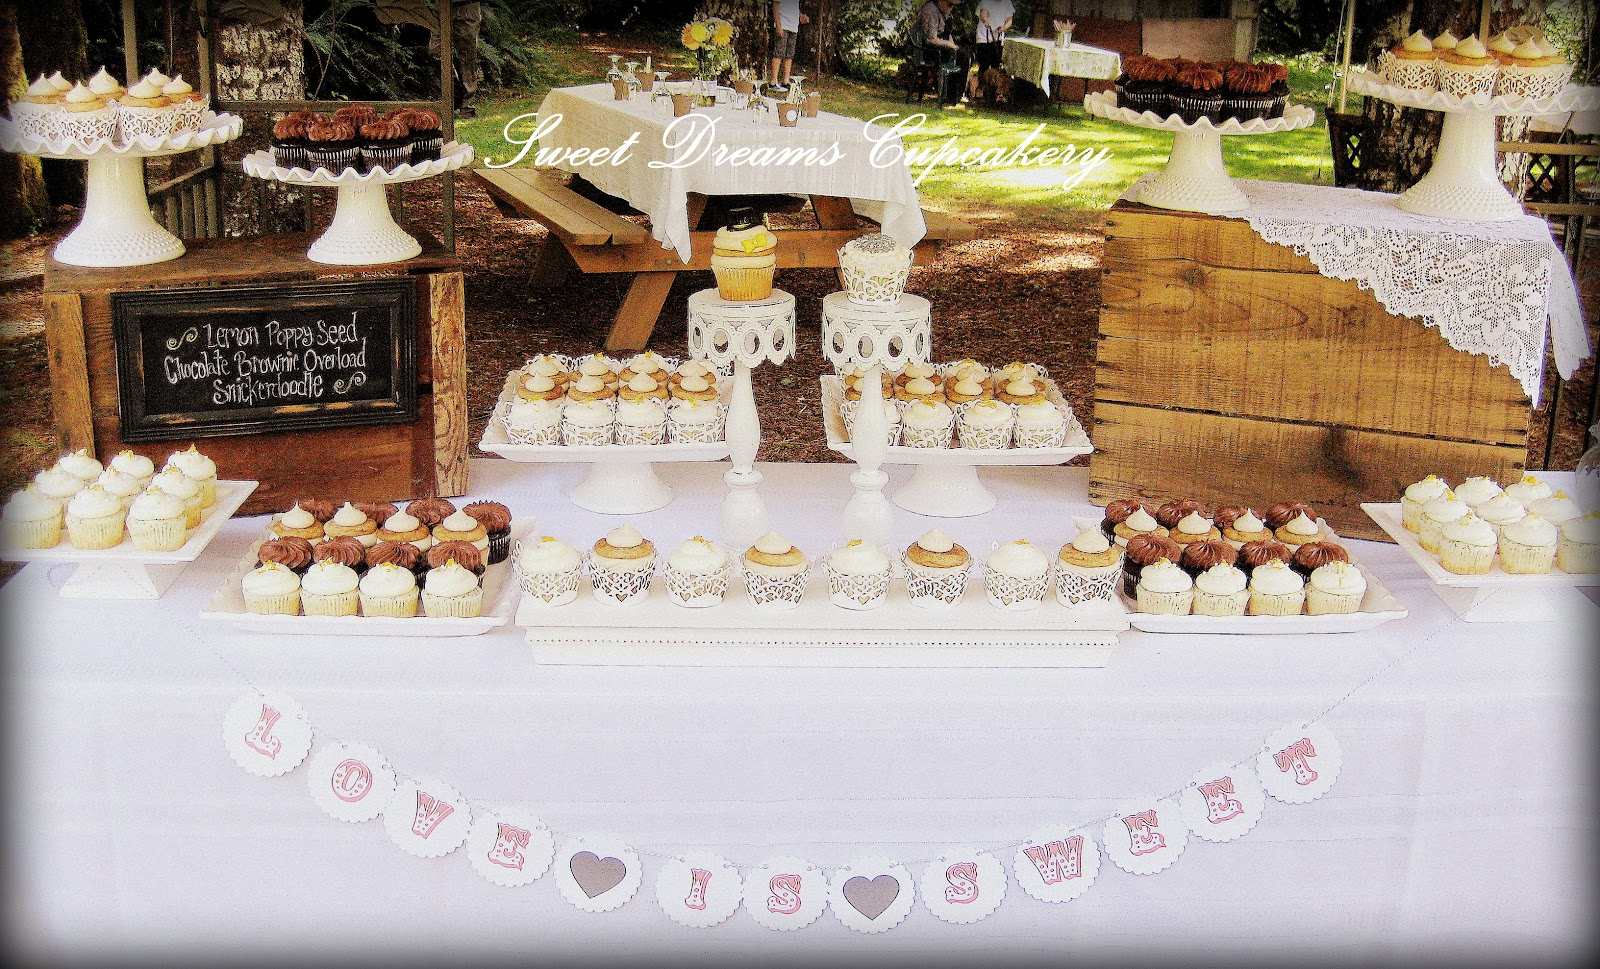 Display Cakes Tables Wedding Cupcakes Dreams